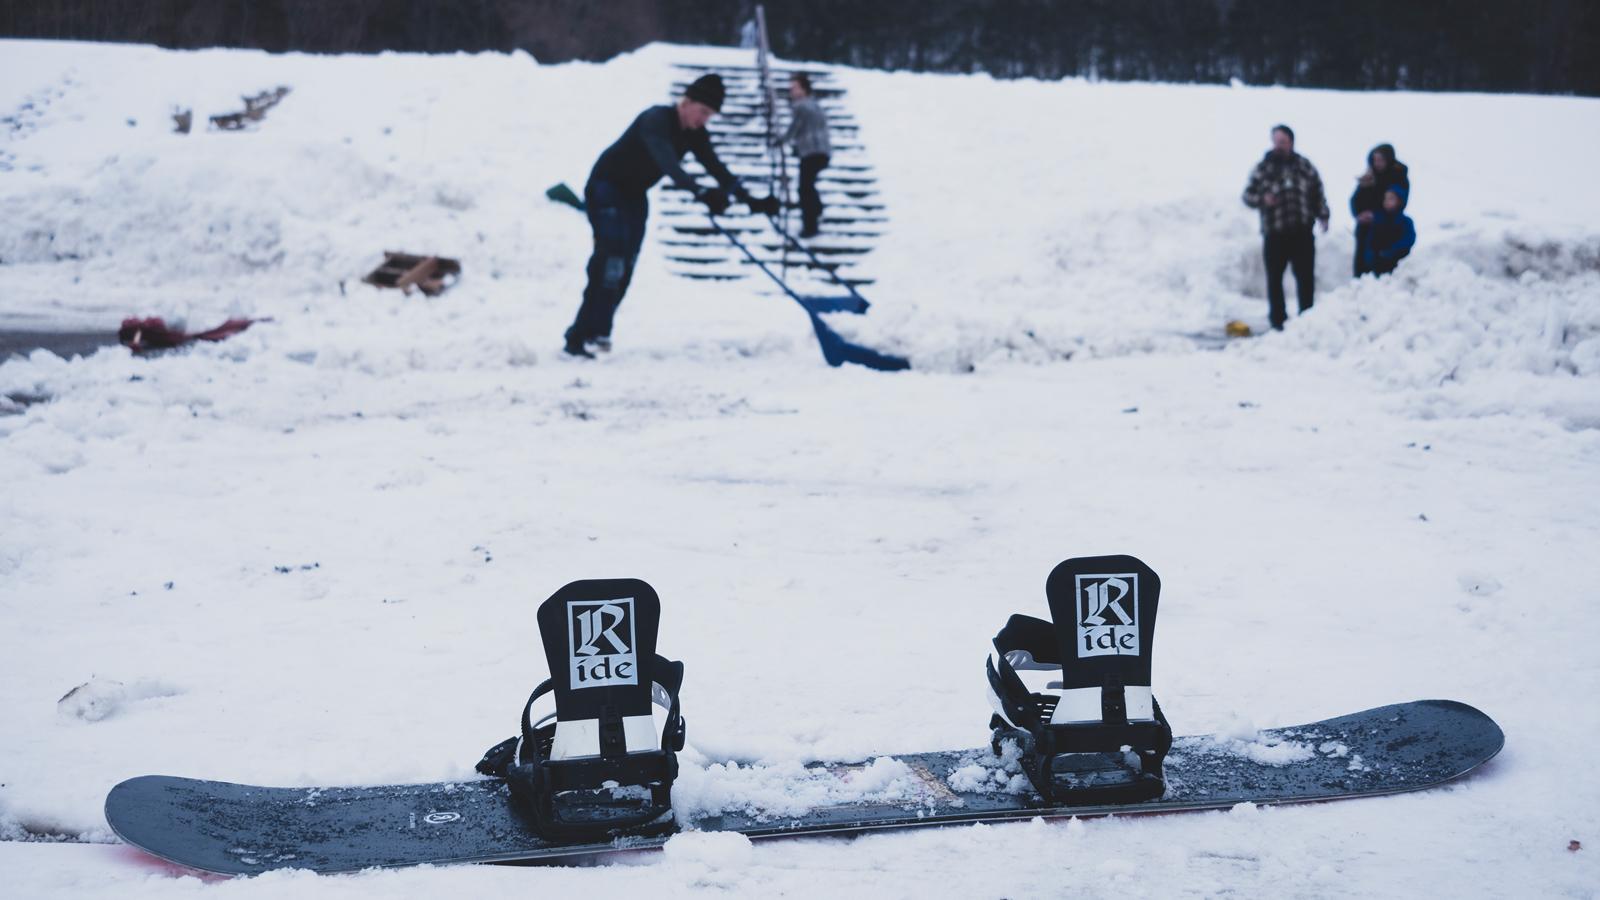 Ride 21/22 Snowboard Bindings